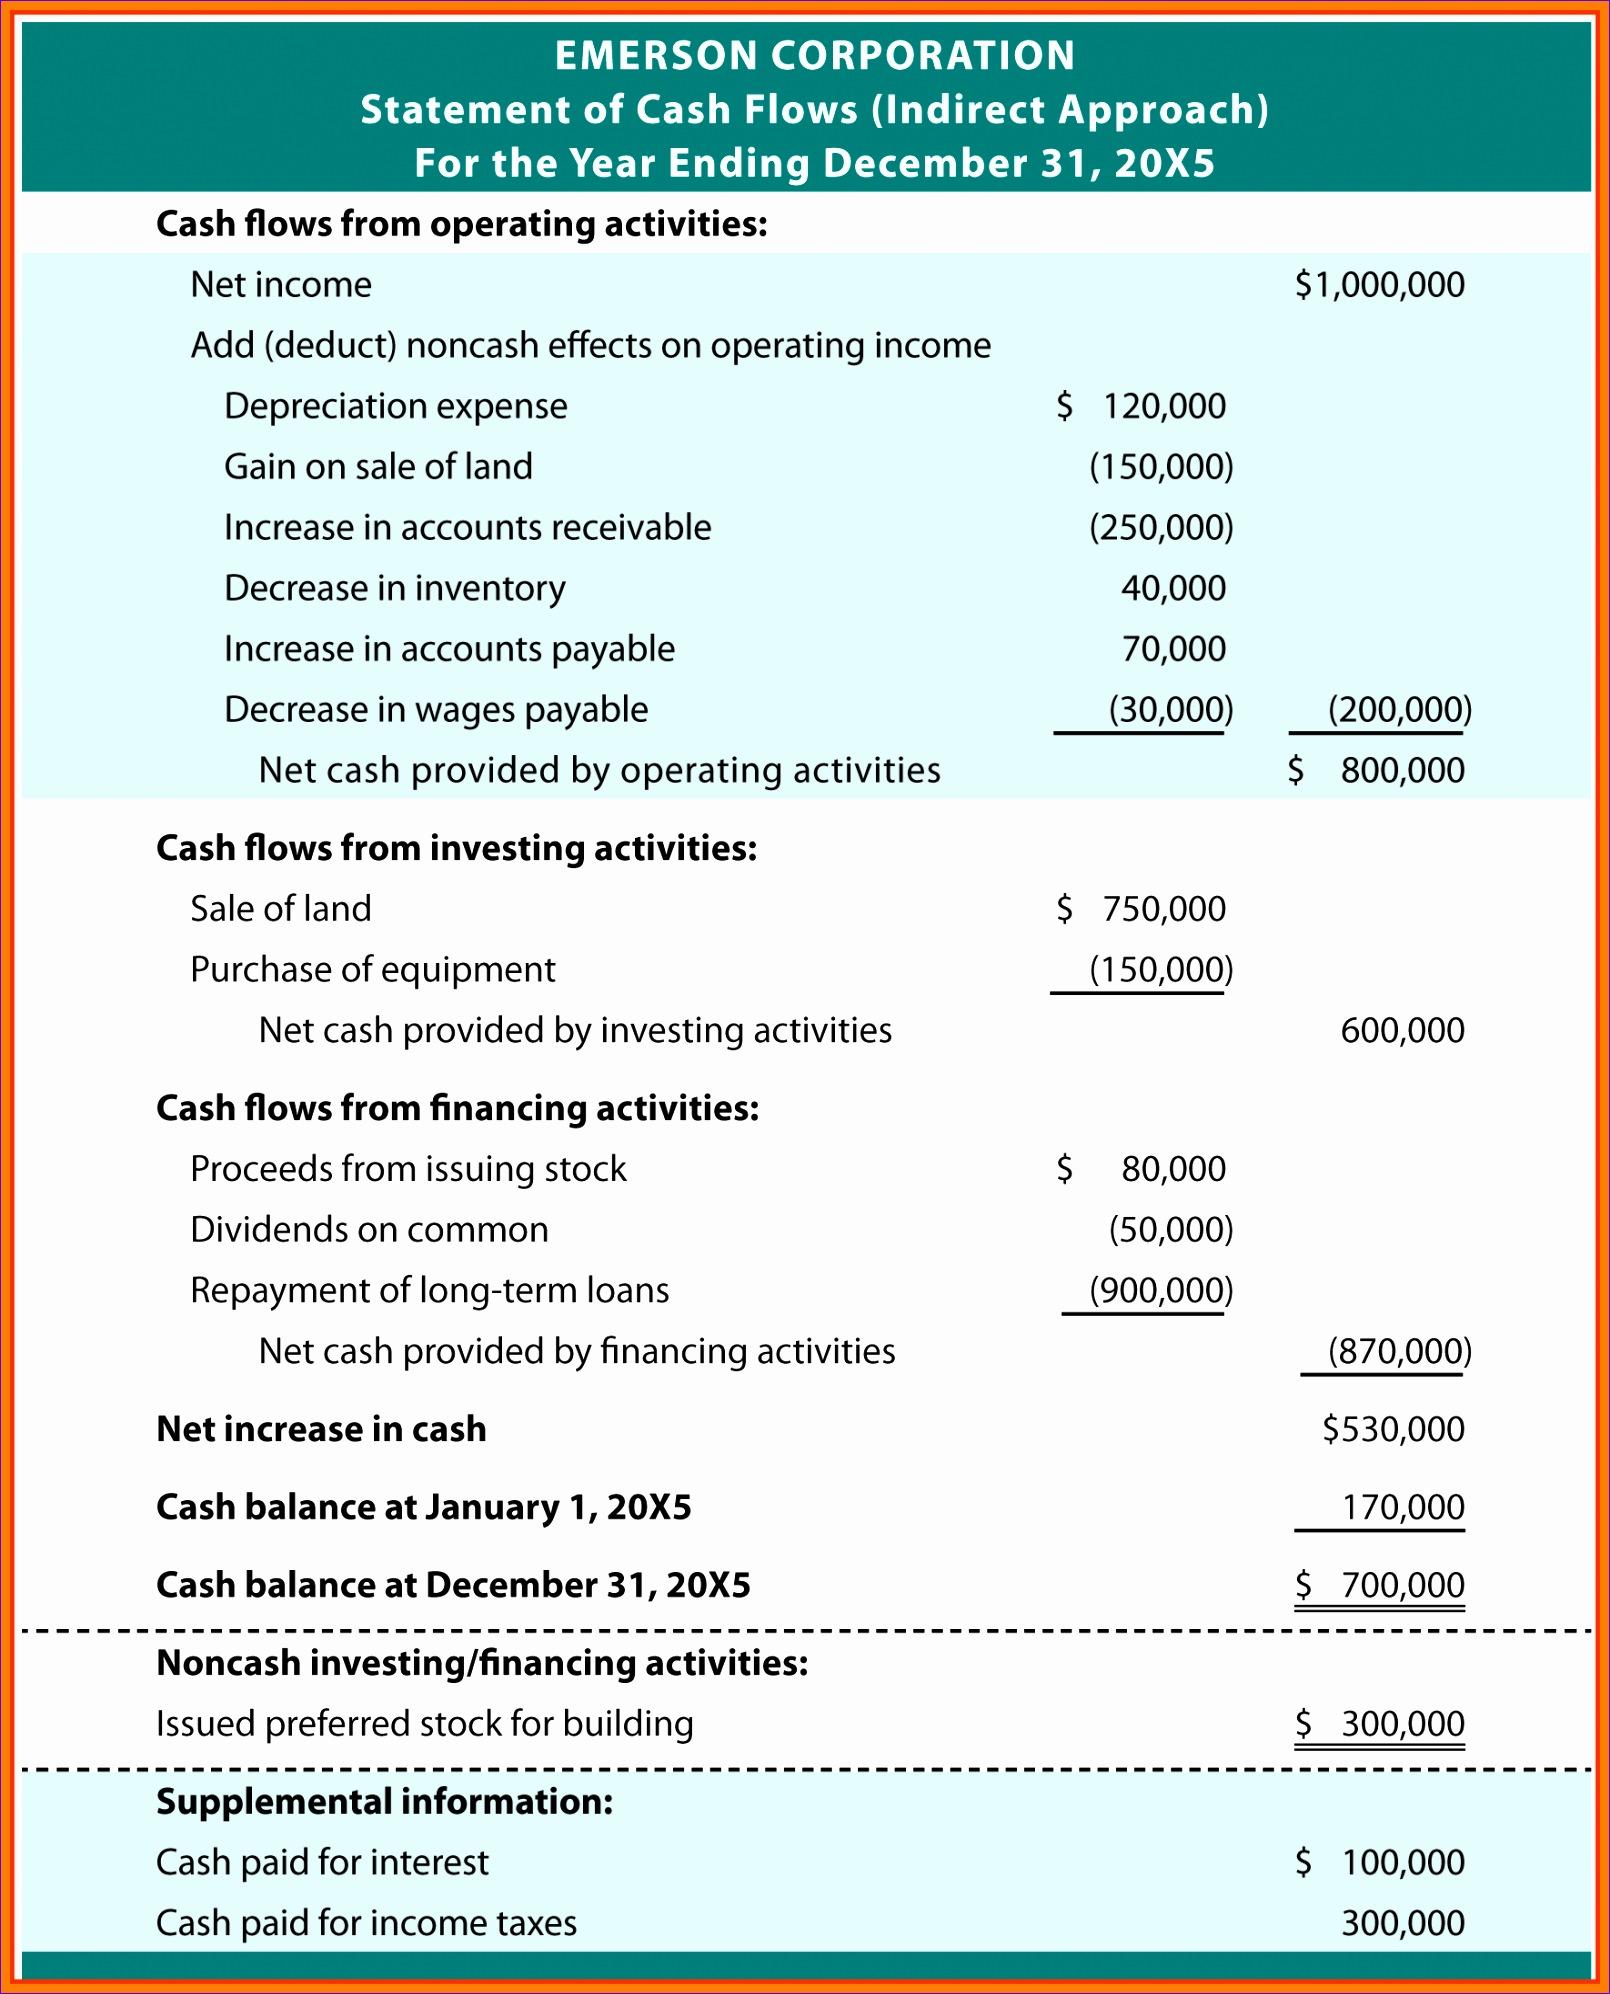 sample cash flow statements cash flow statement example emersonindirect